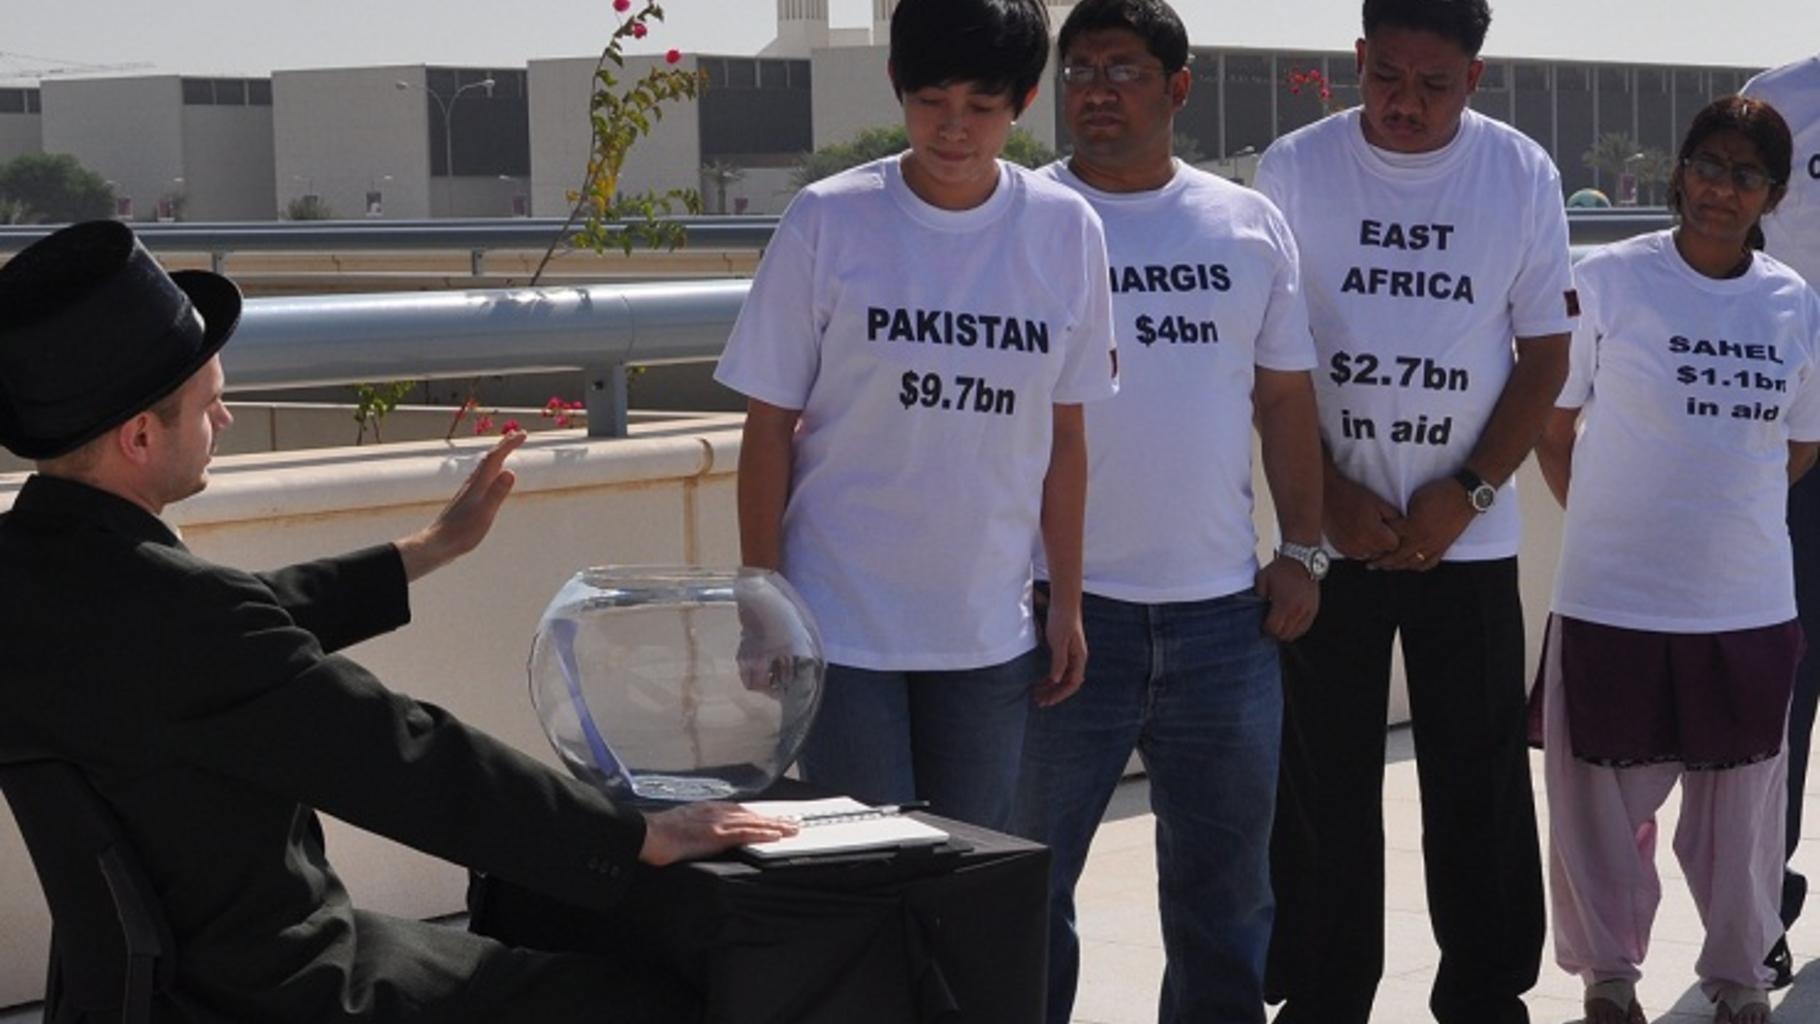 Foto: Oxfam-Aktion in Doha